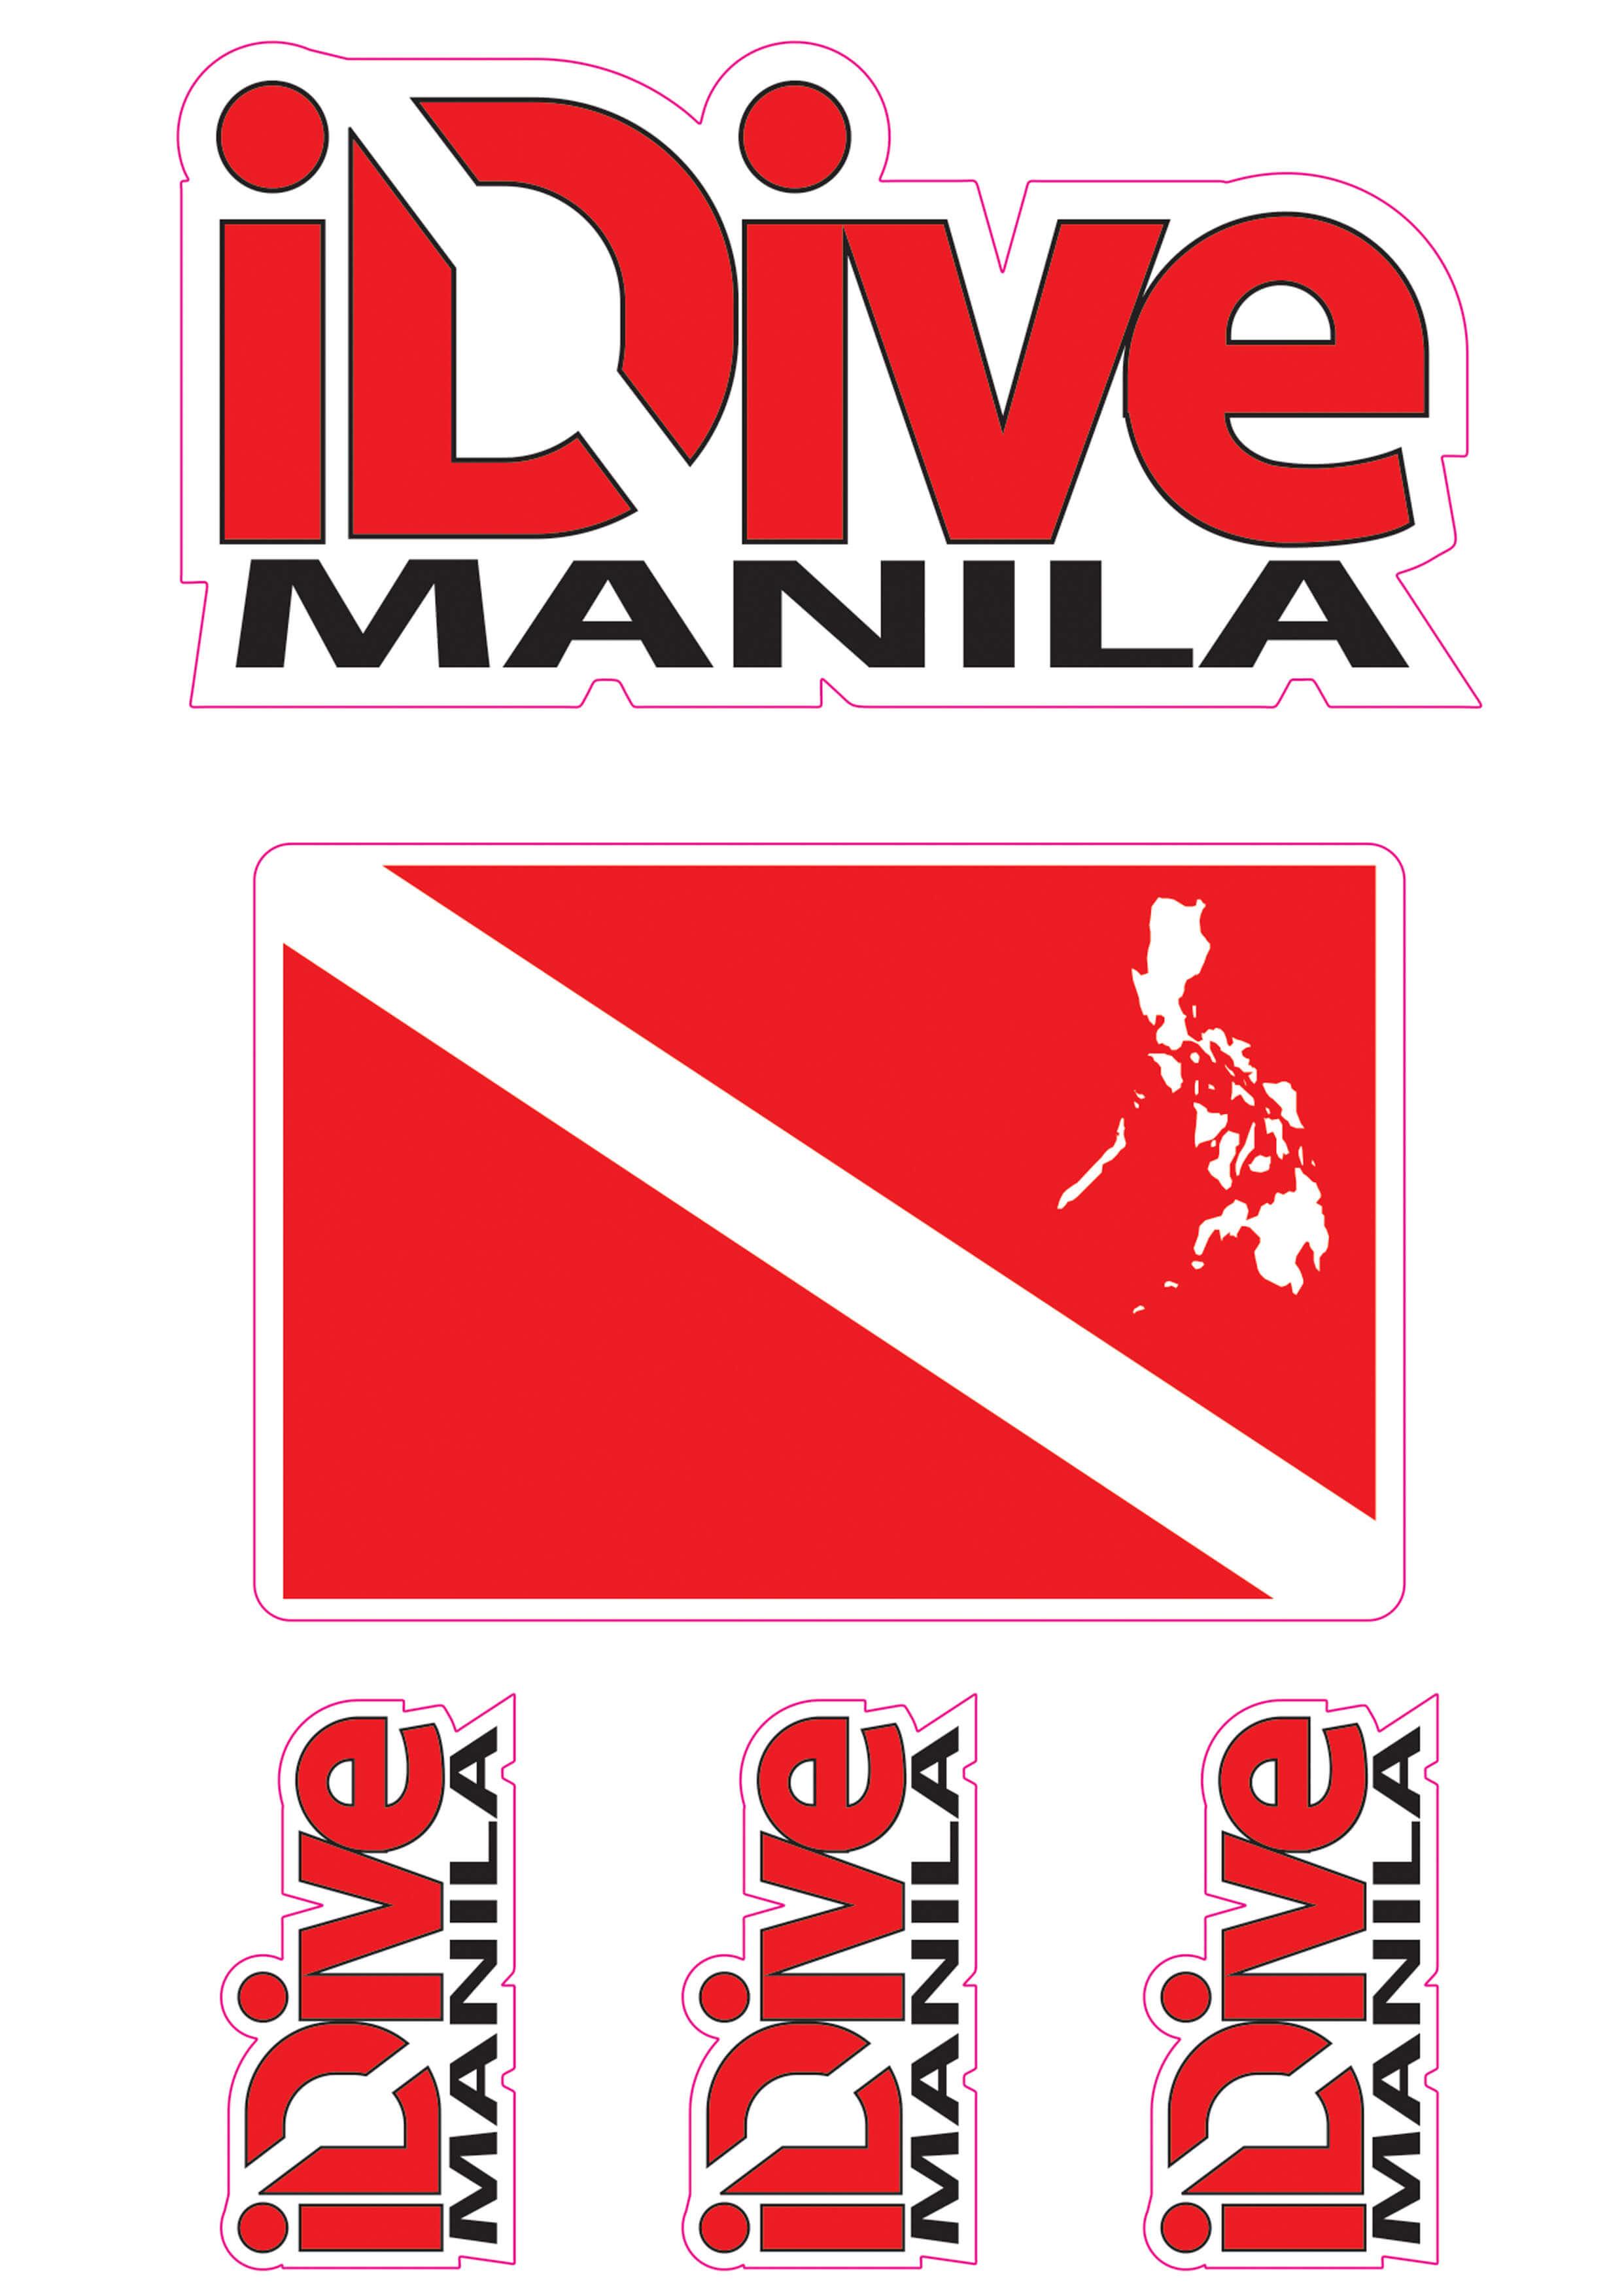 iDive Manila